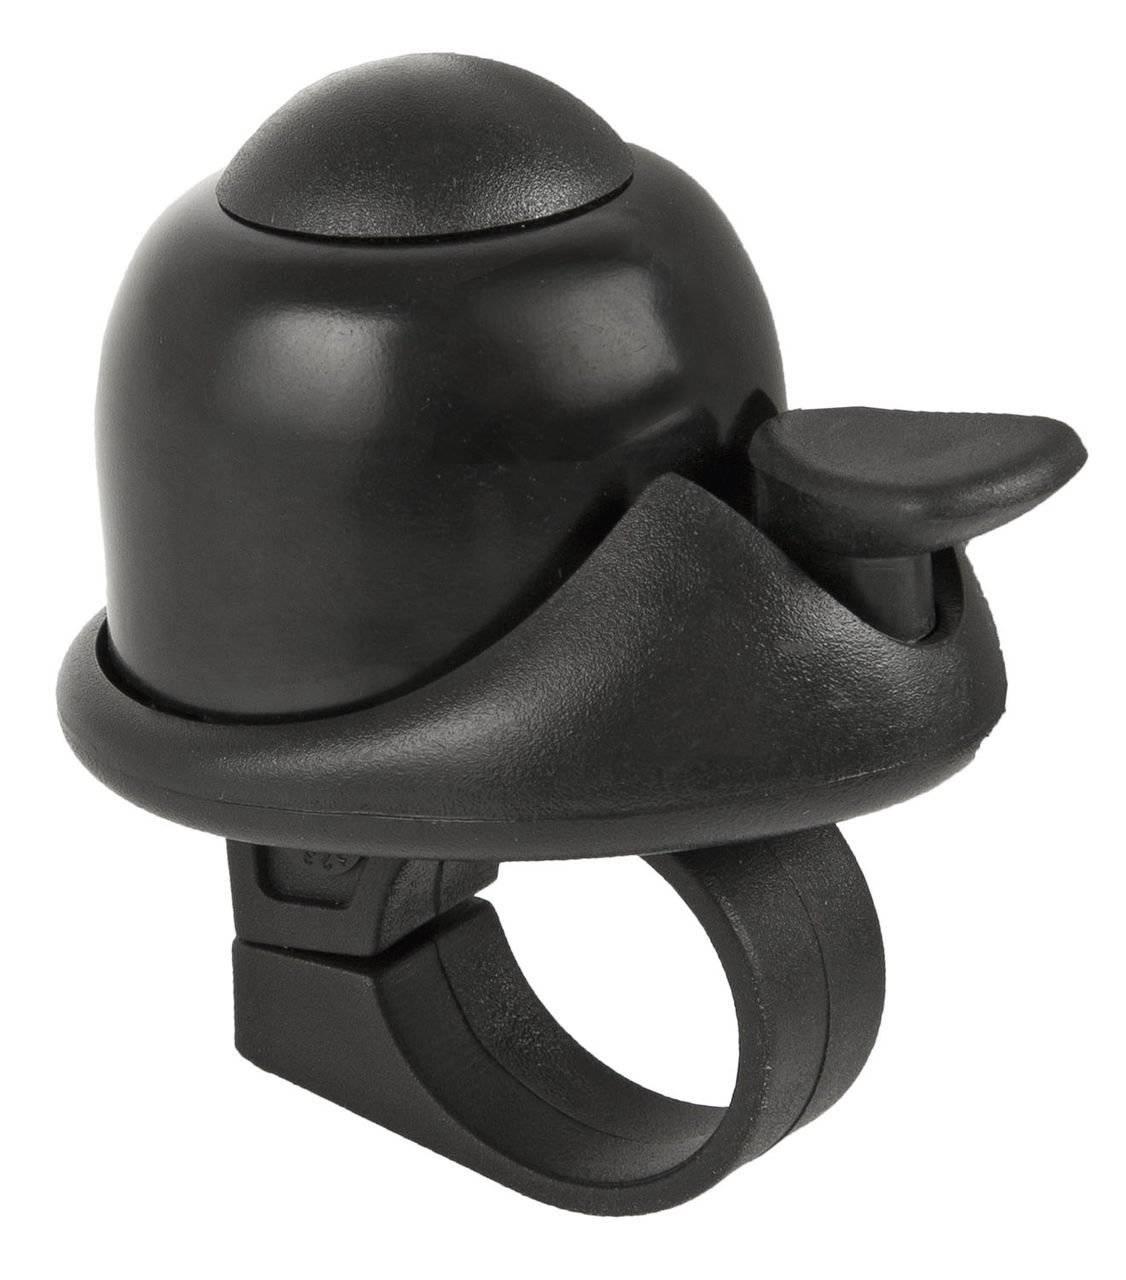 Звонок M-WAVE, алюминий/пластик, мини D=36 мм, громкий и долгий звук, черный, 5-420066